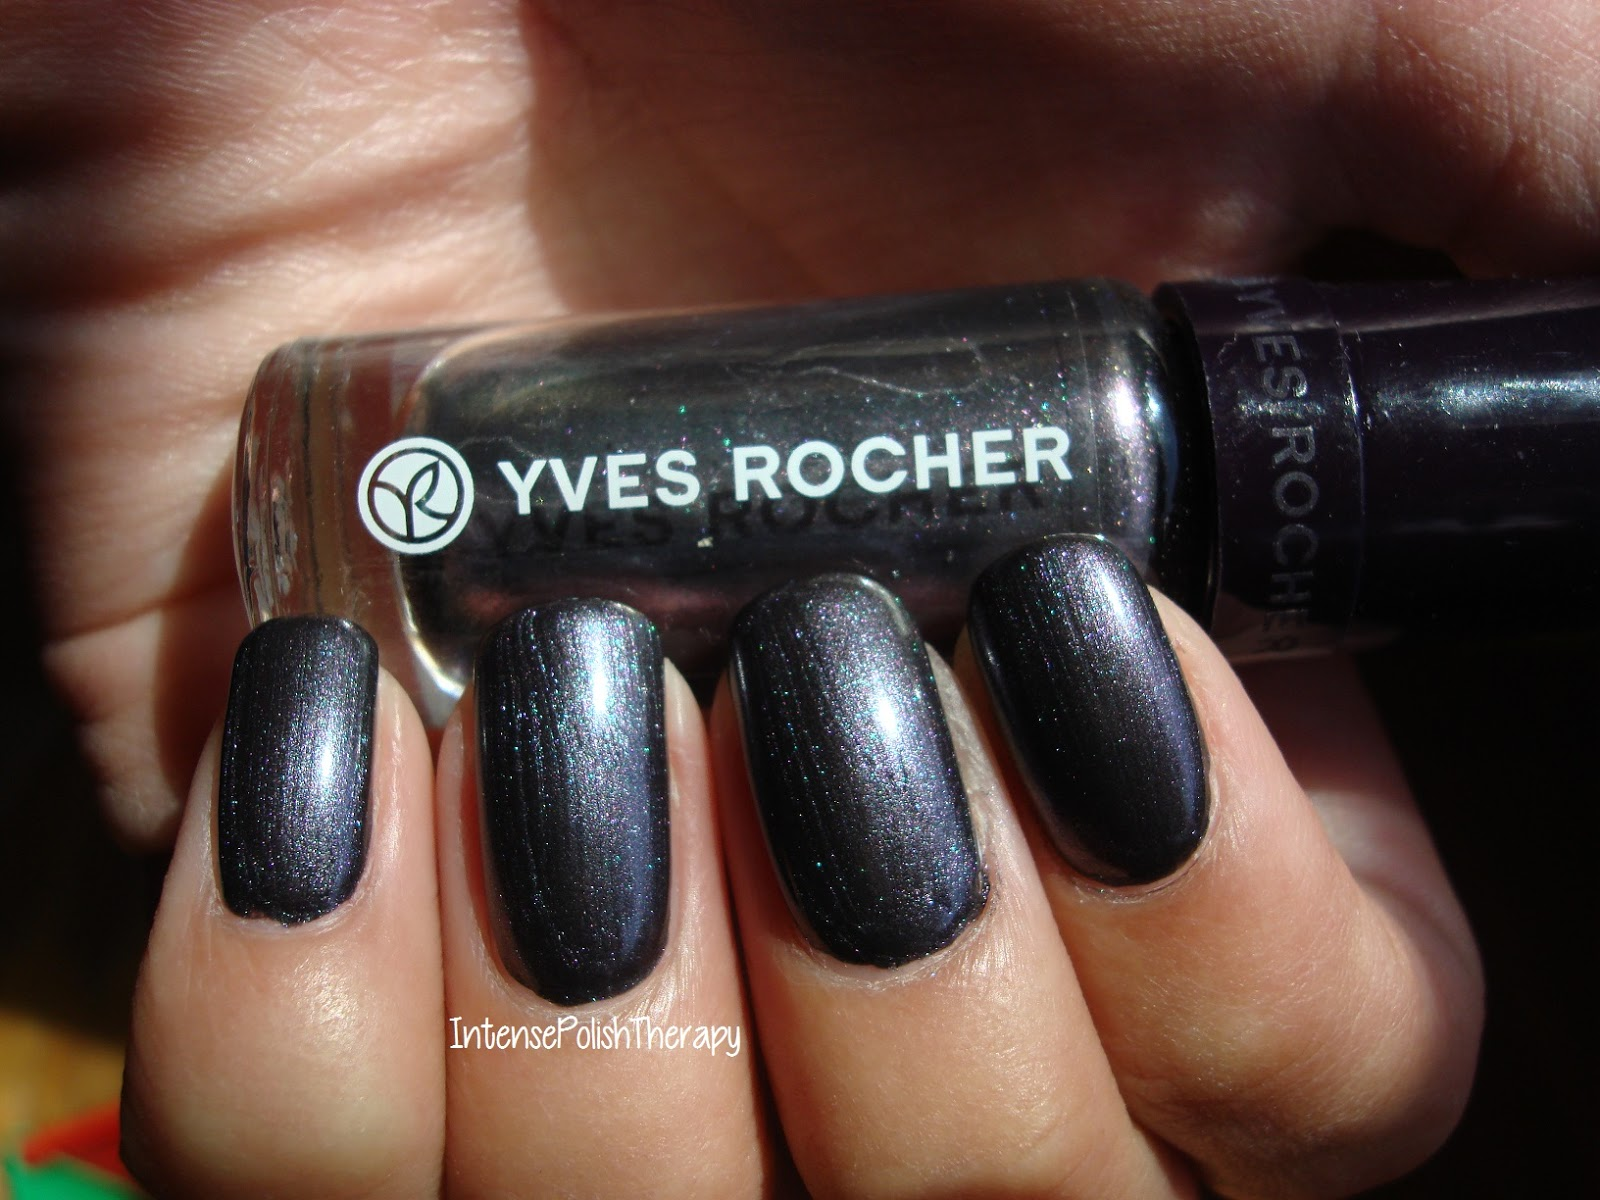 Yves Rocher - Anthracite Iridescent